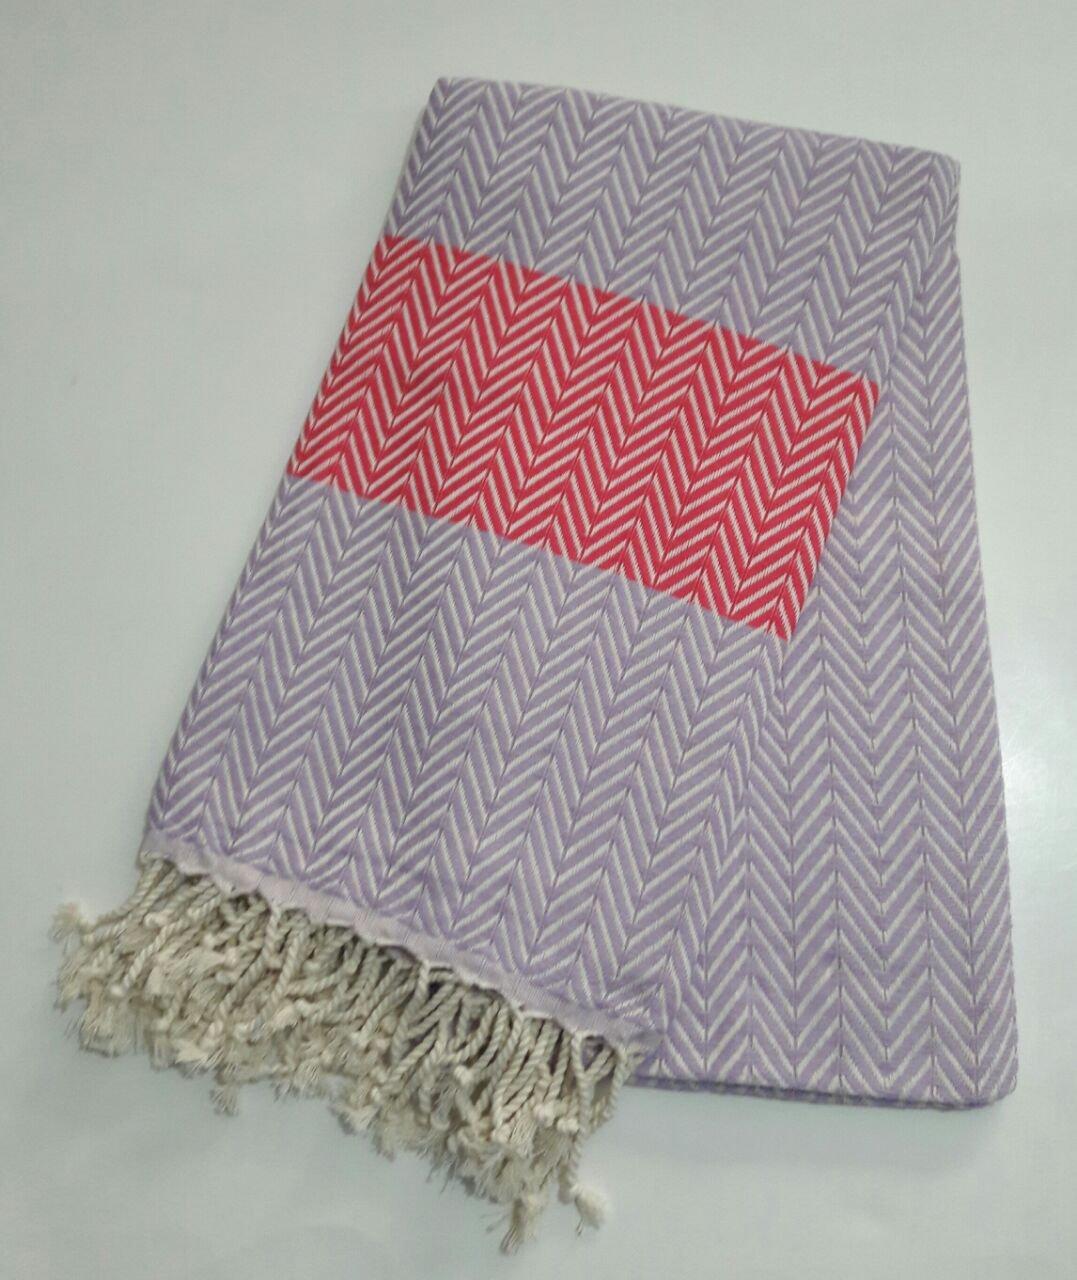 "Paramus Turkish Cotton Bath Beach Hammam Towel Peshtemal Blanket (Purple-Pink, 1) - 100% COTTON Made in Turkey 95x175 cm (""37x70"" inches) - bathroom-linens, bathroom, bath-towels - 71ewGuA7nEL -"